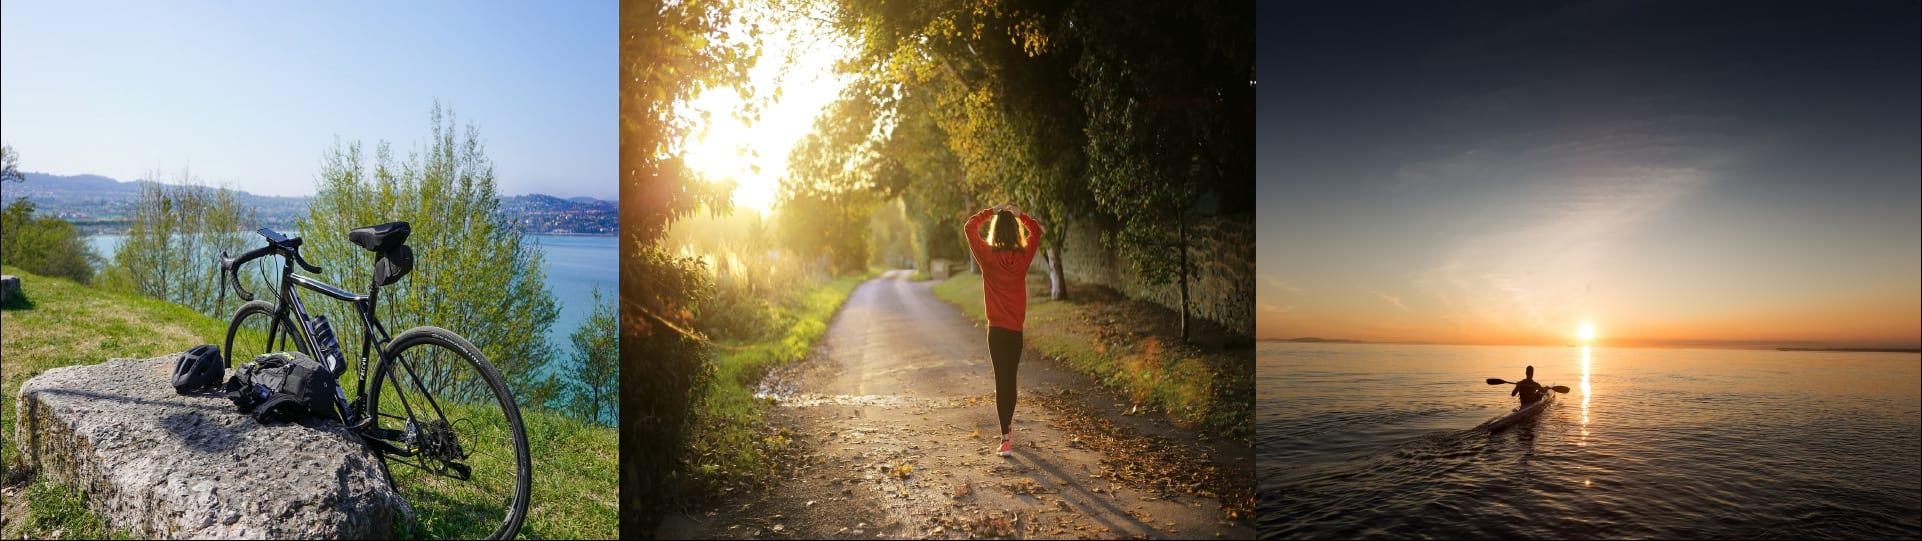 Biking, hiking and rowing outdoor sport activities image